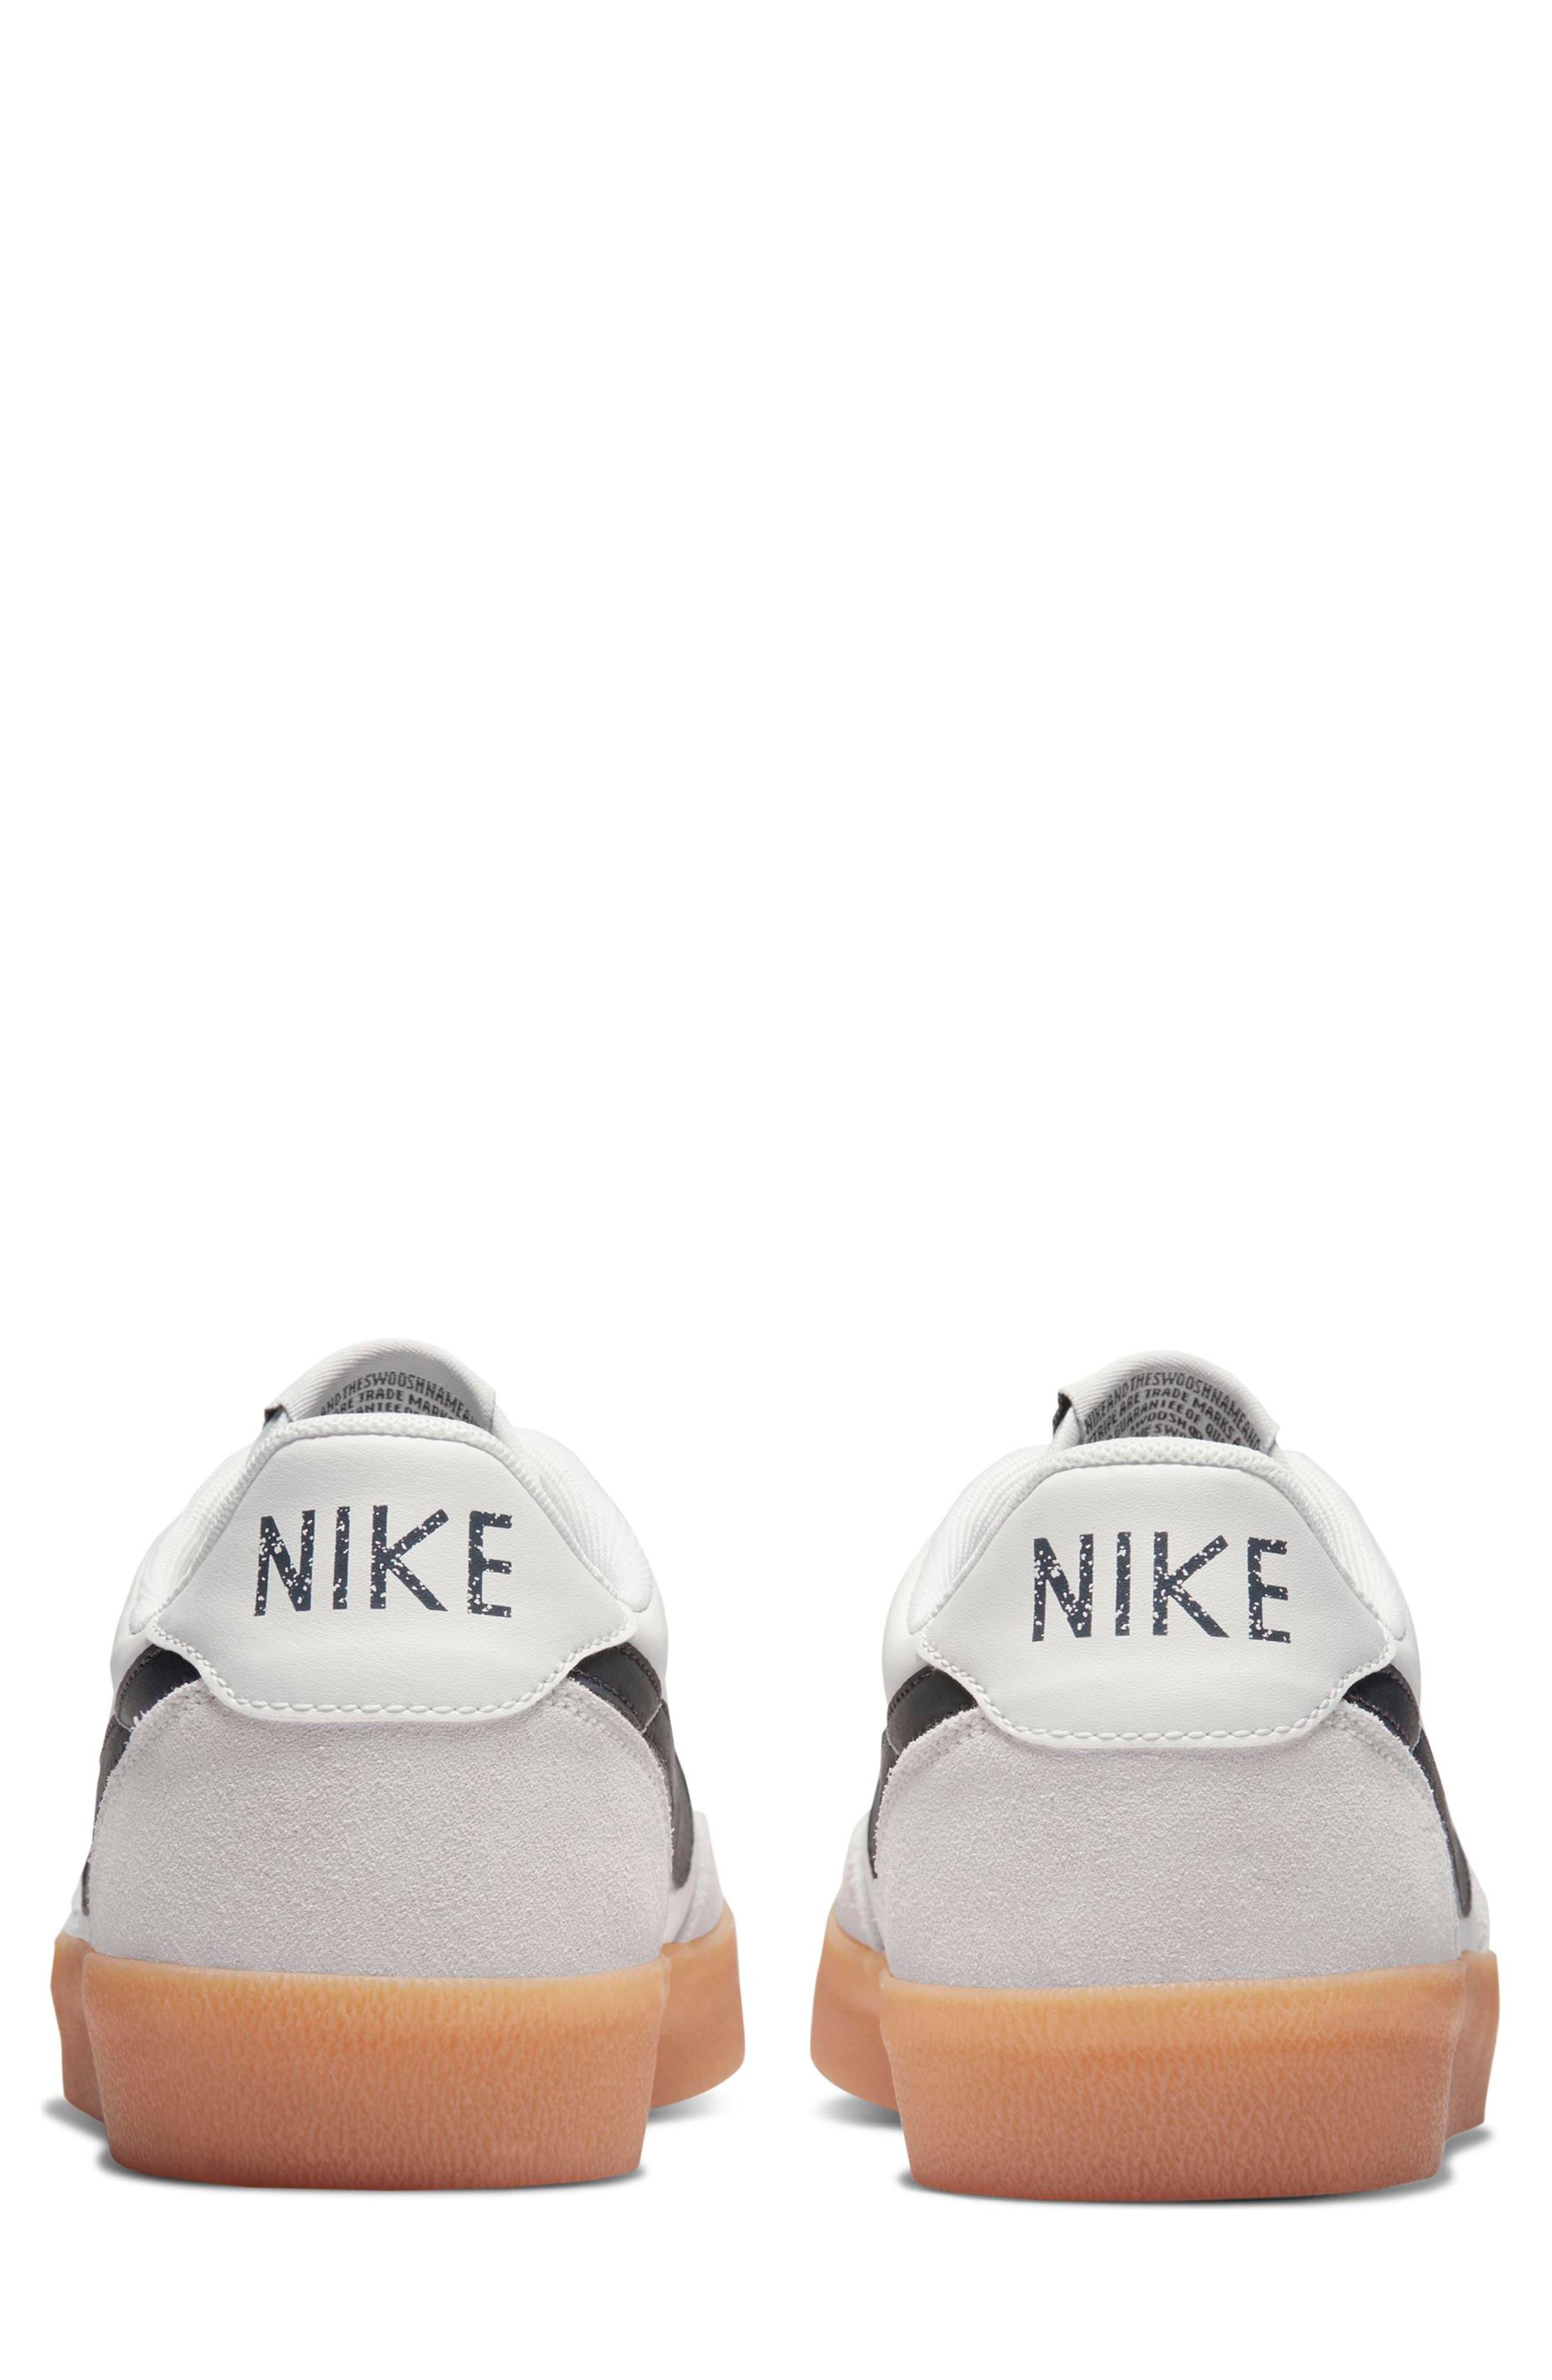 Nike Sneakers 'Killshot 2' Sneaker